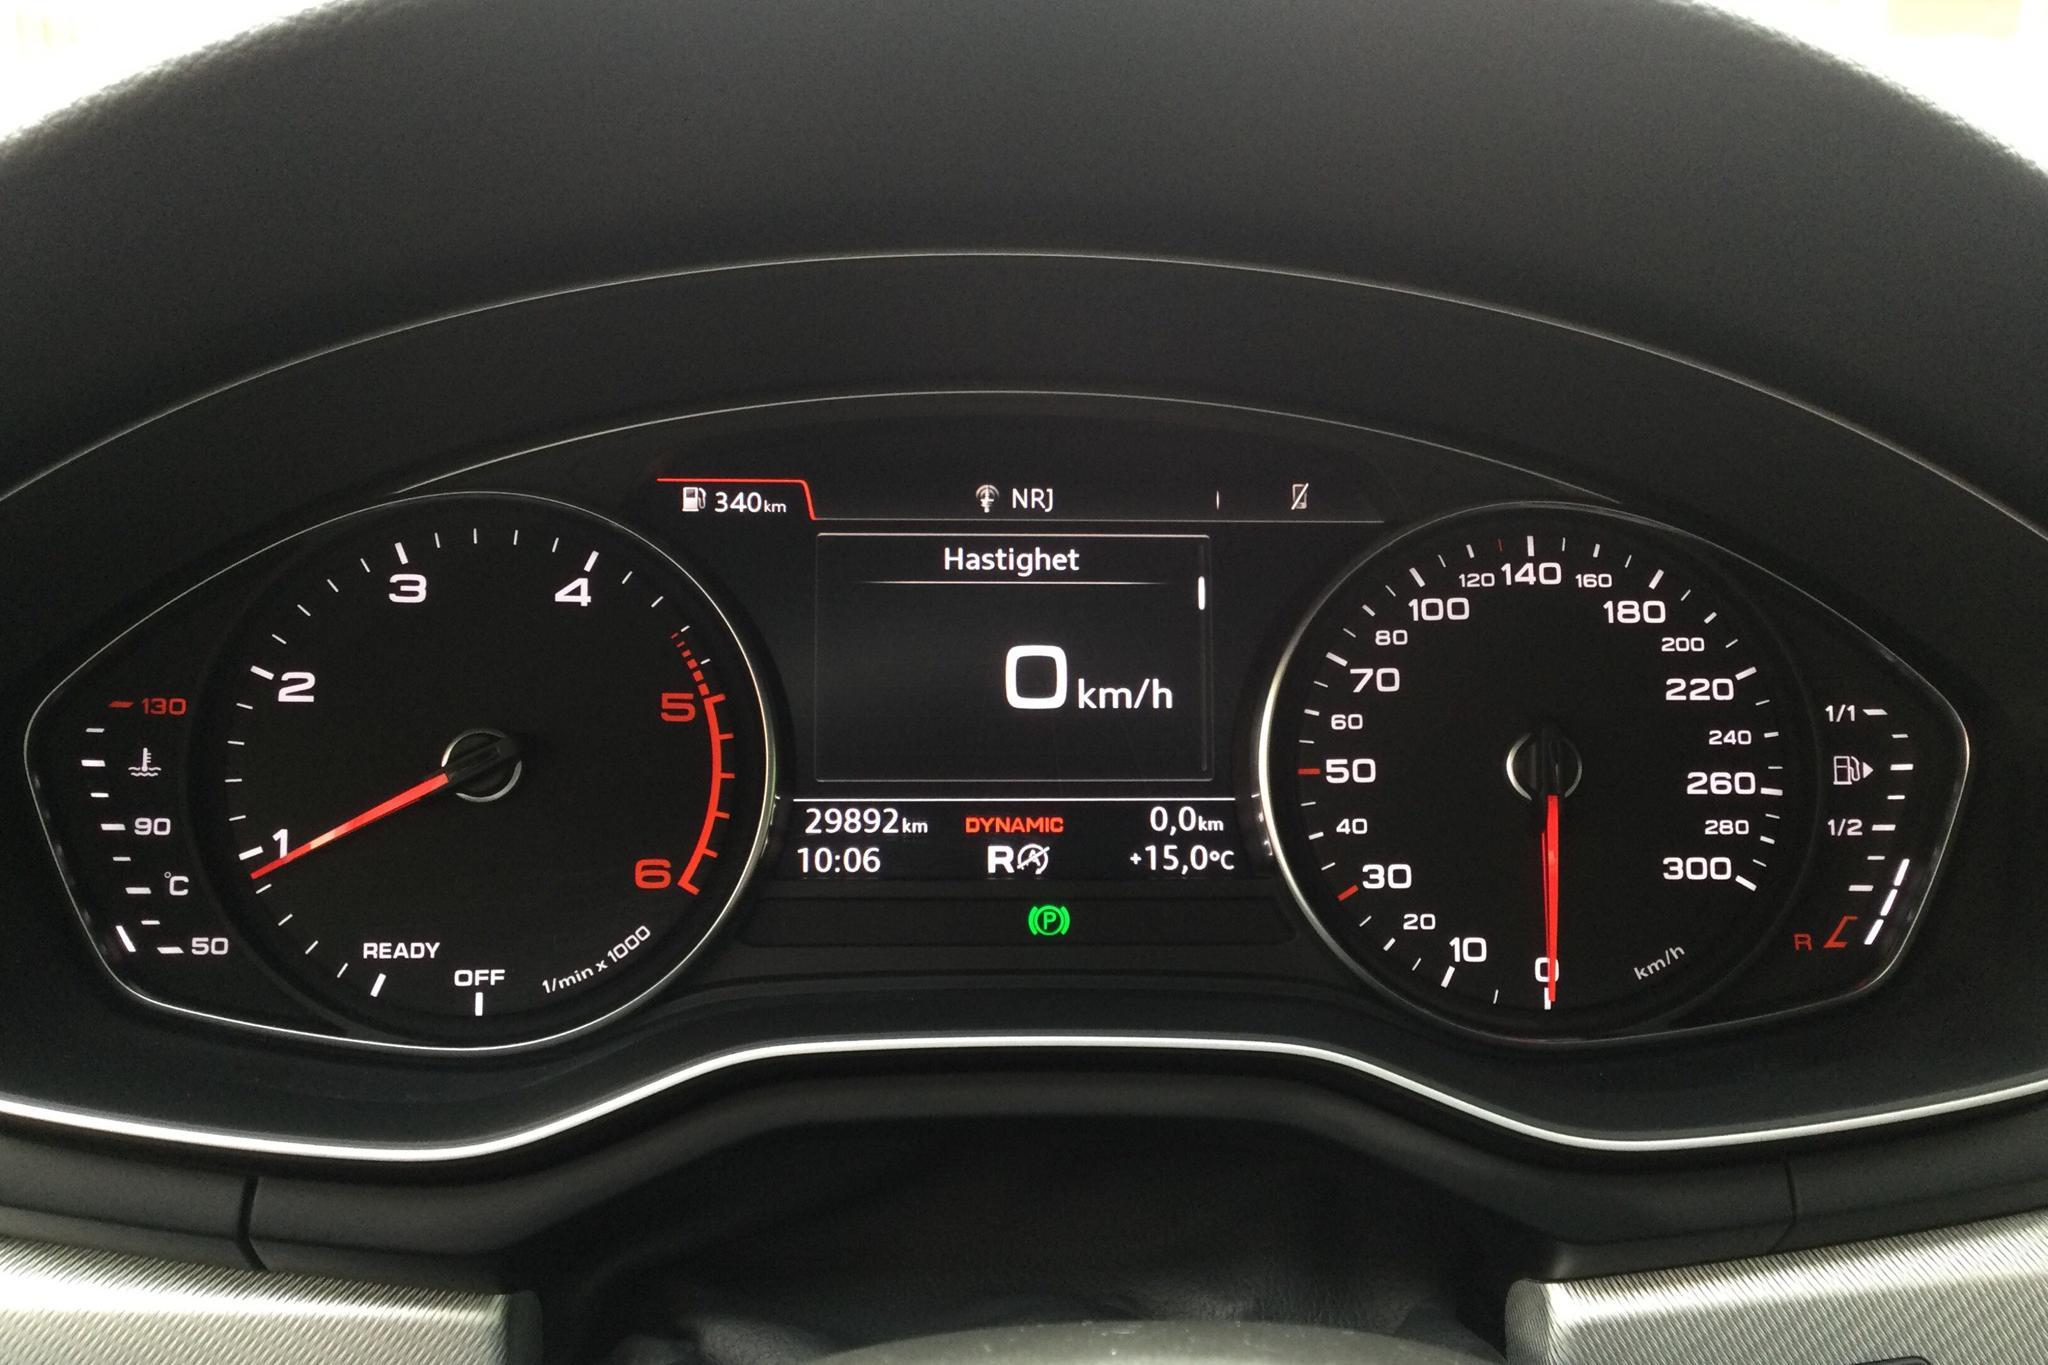 Audi A4 2.0 TDI Avant quattro (190hk) - 29 910 km - Automatic - black - 2018